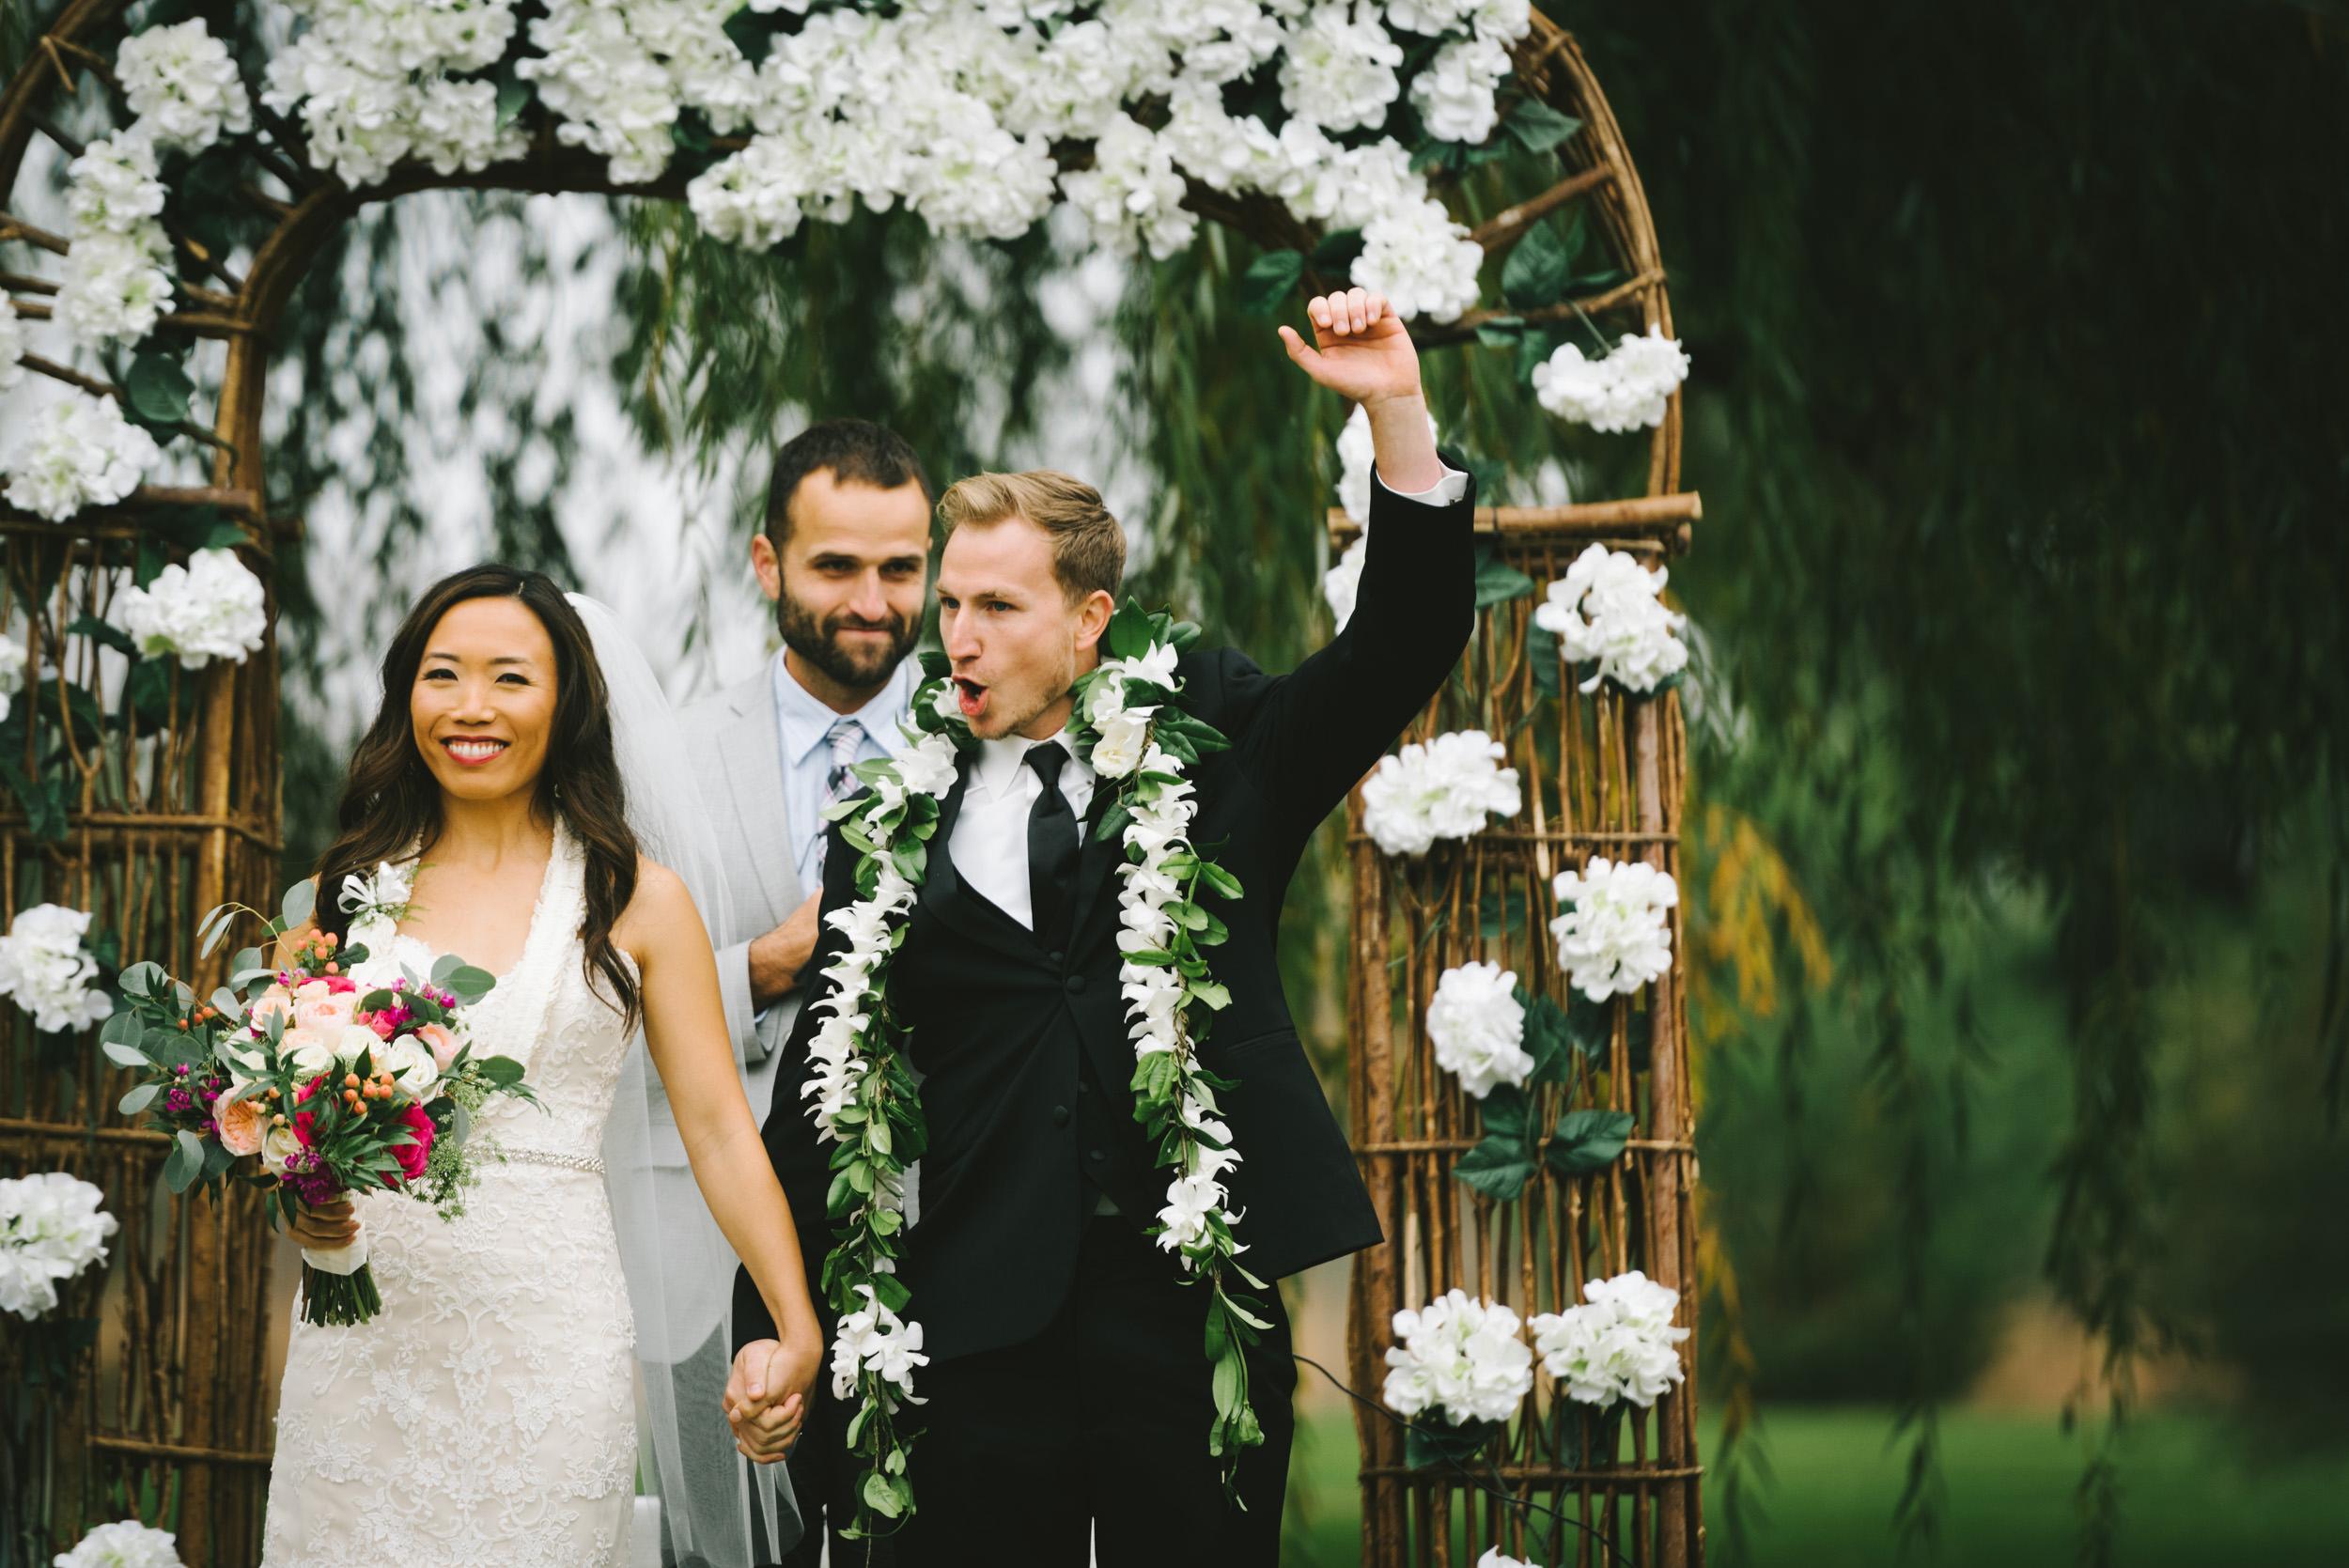 20171029_Wedding-Kristin-Garrett-523.jpg